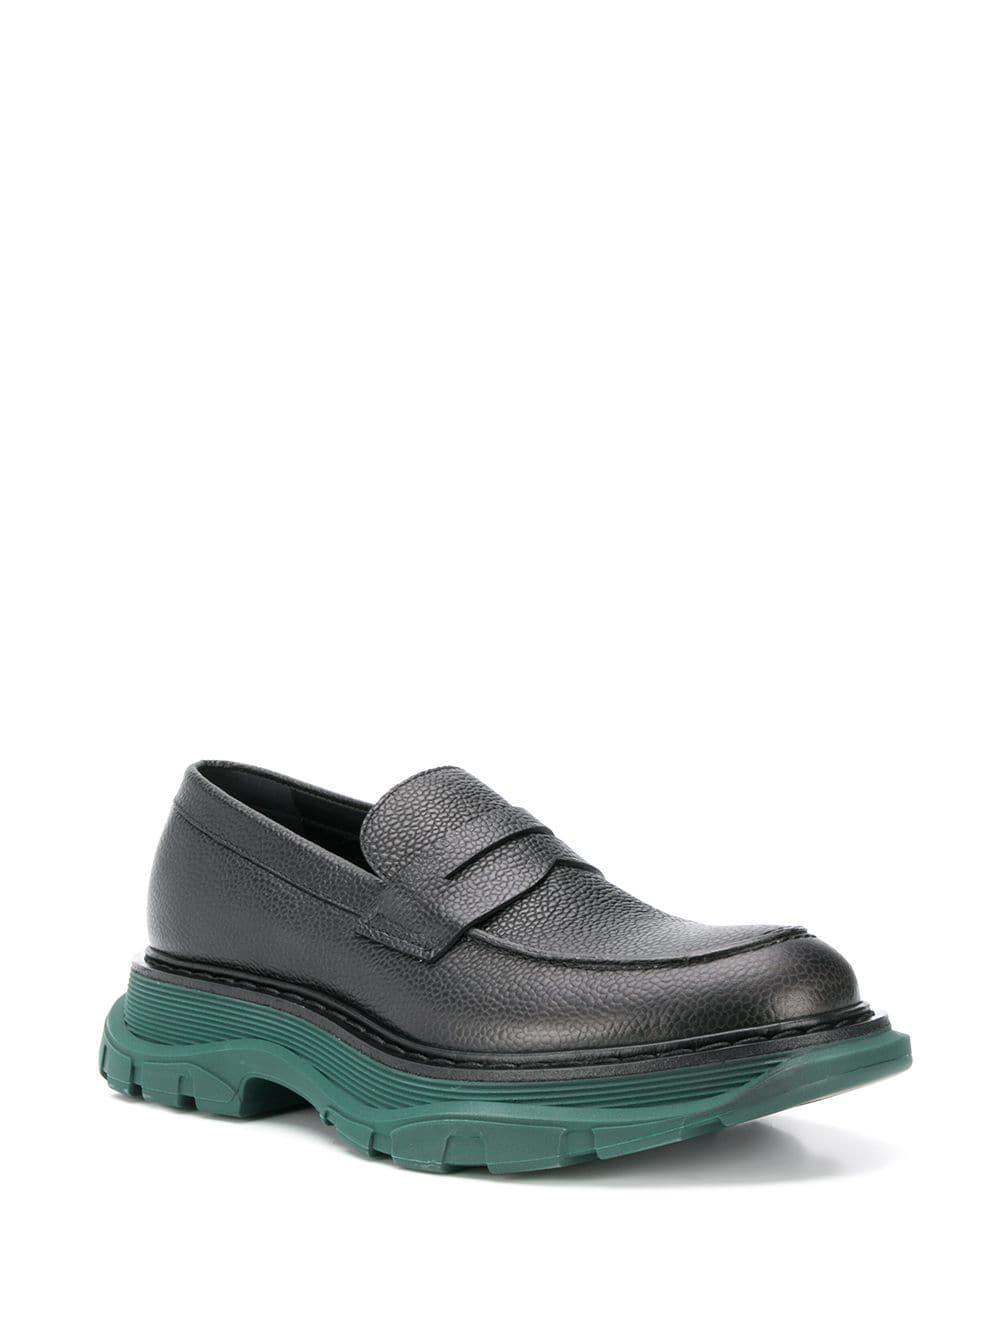 6f773633a95f5 Alexander McQueen - Black Thread Loafers for Men - Lyst. View fullscreen